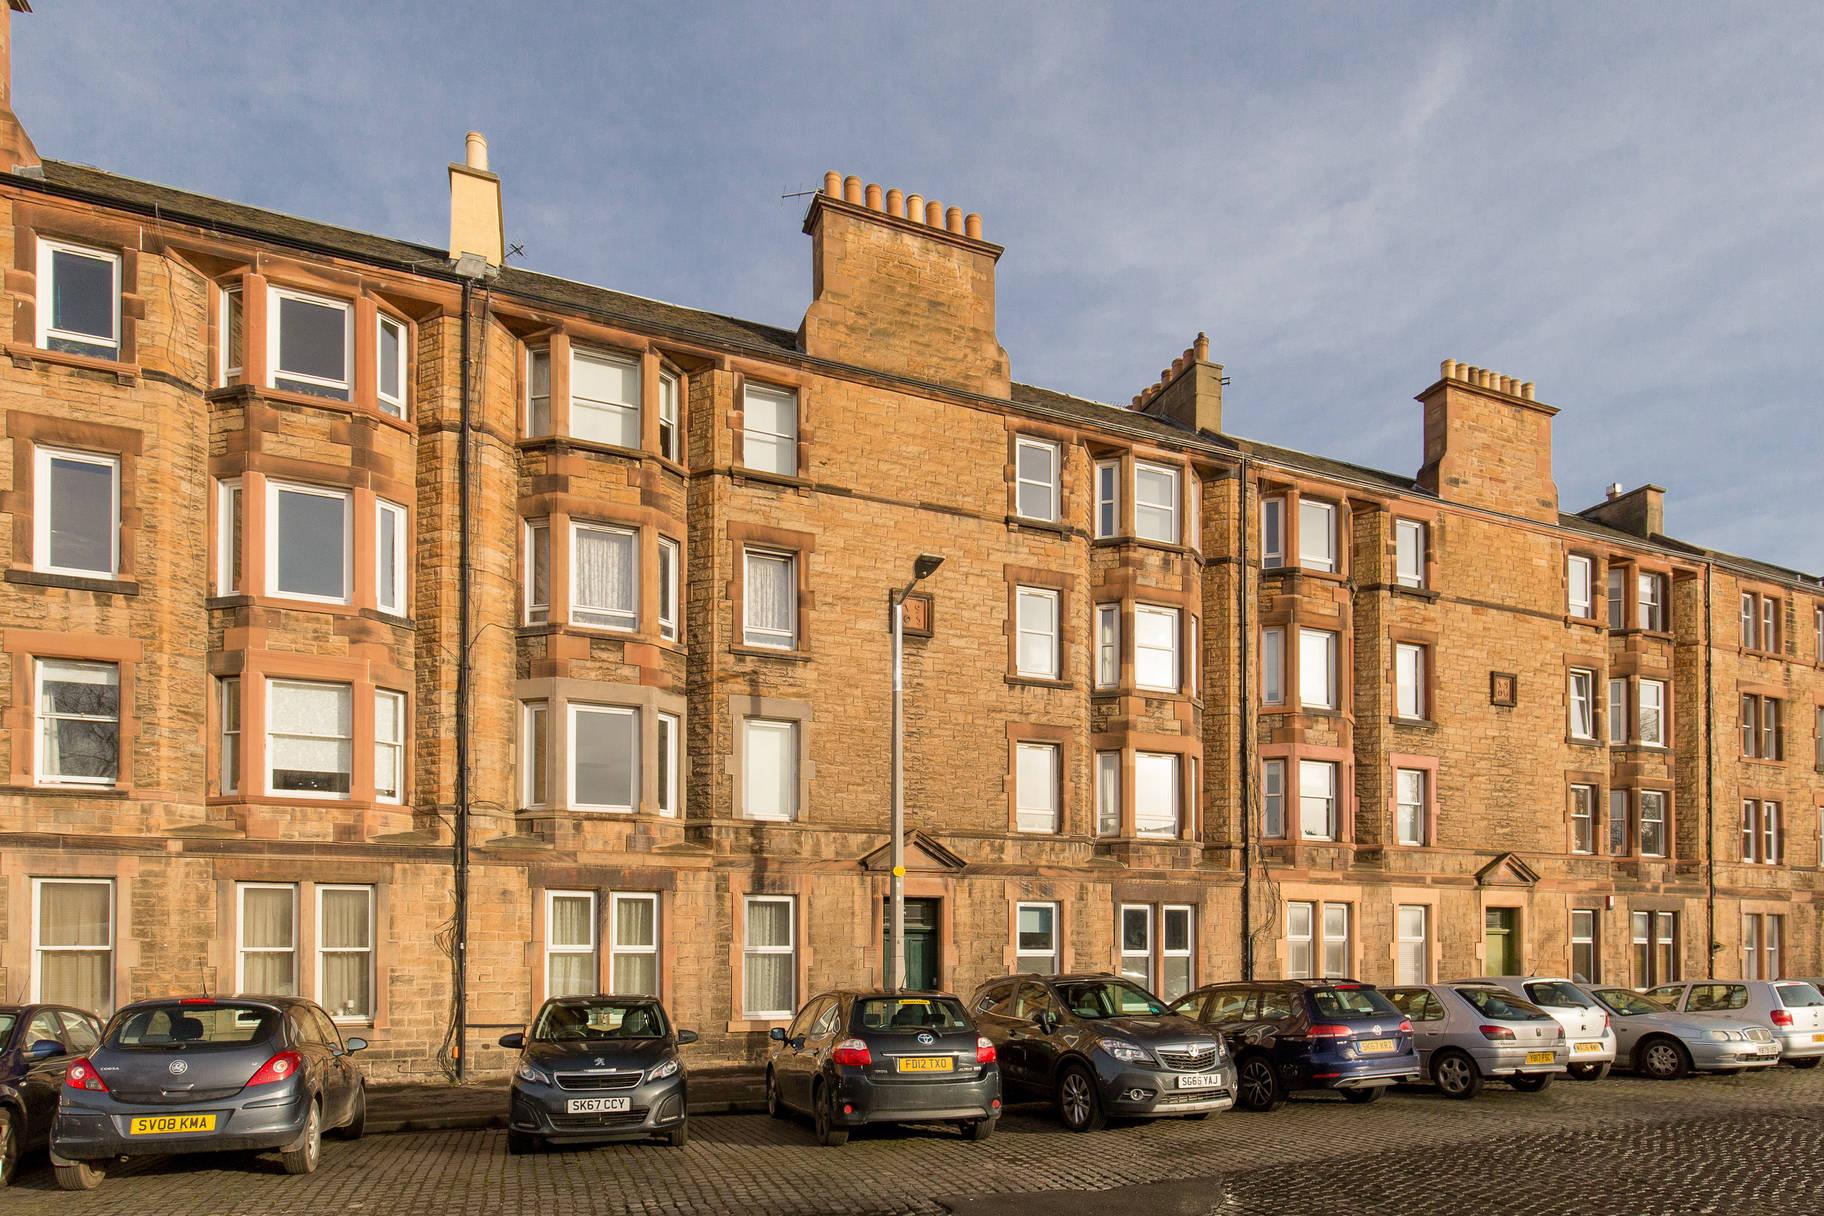 71/2 Dalmeny Street, Edinburgh, EH6 8PW